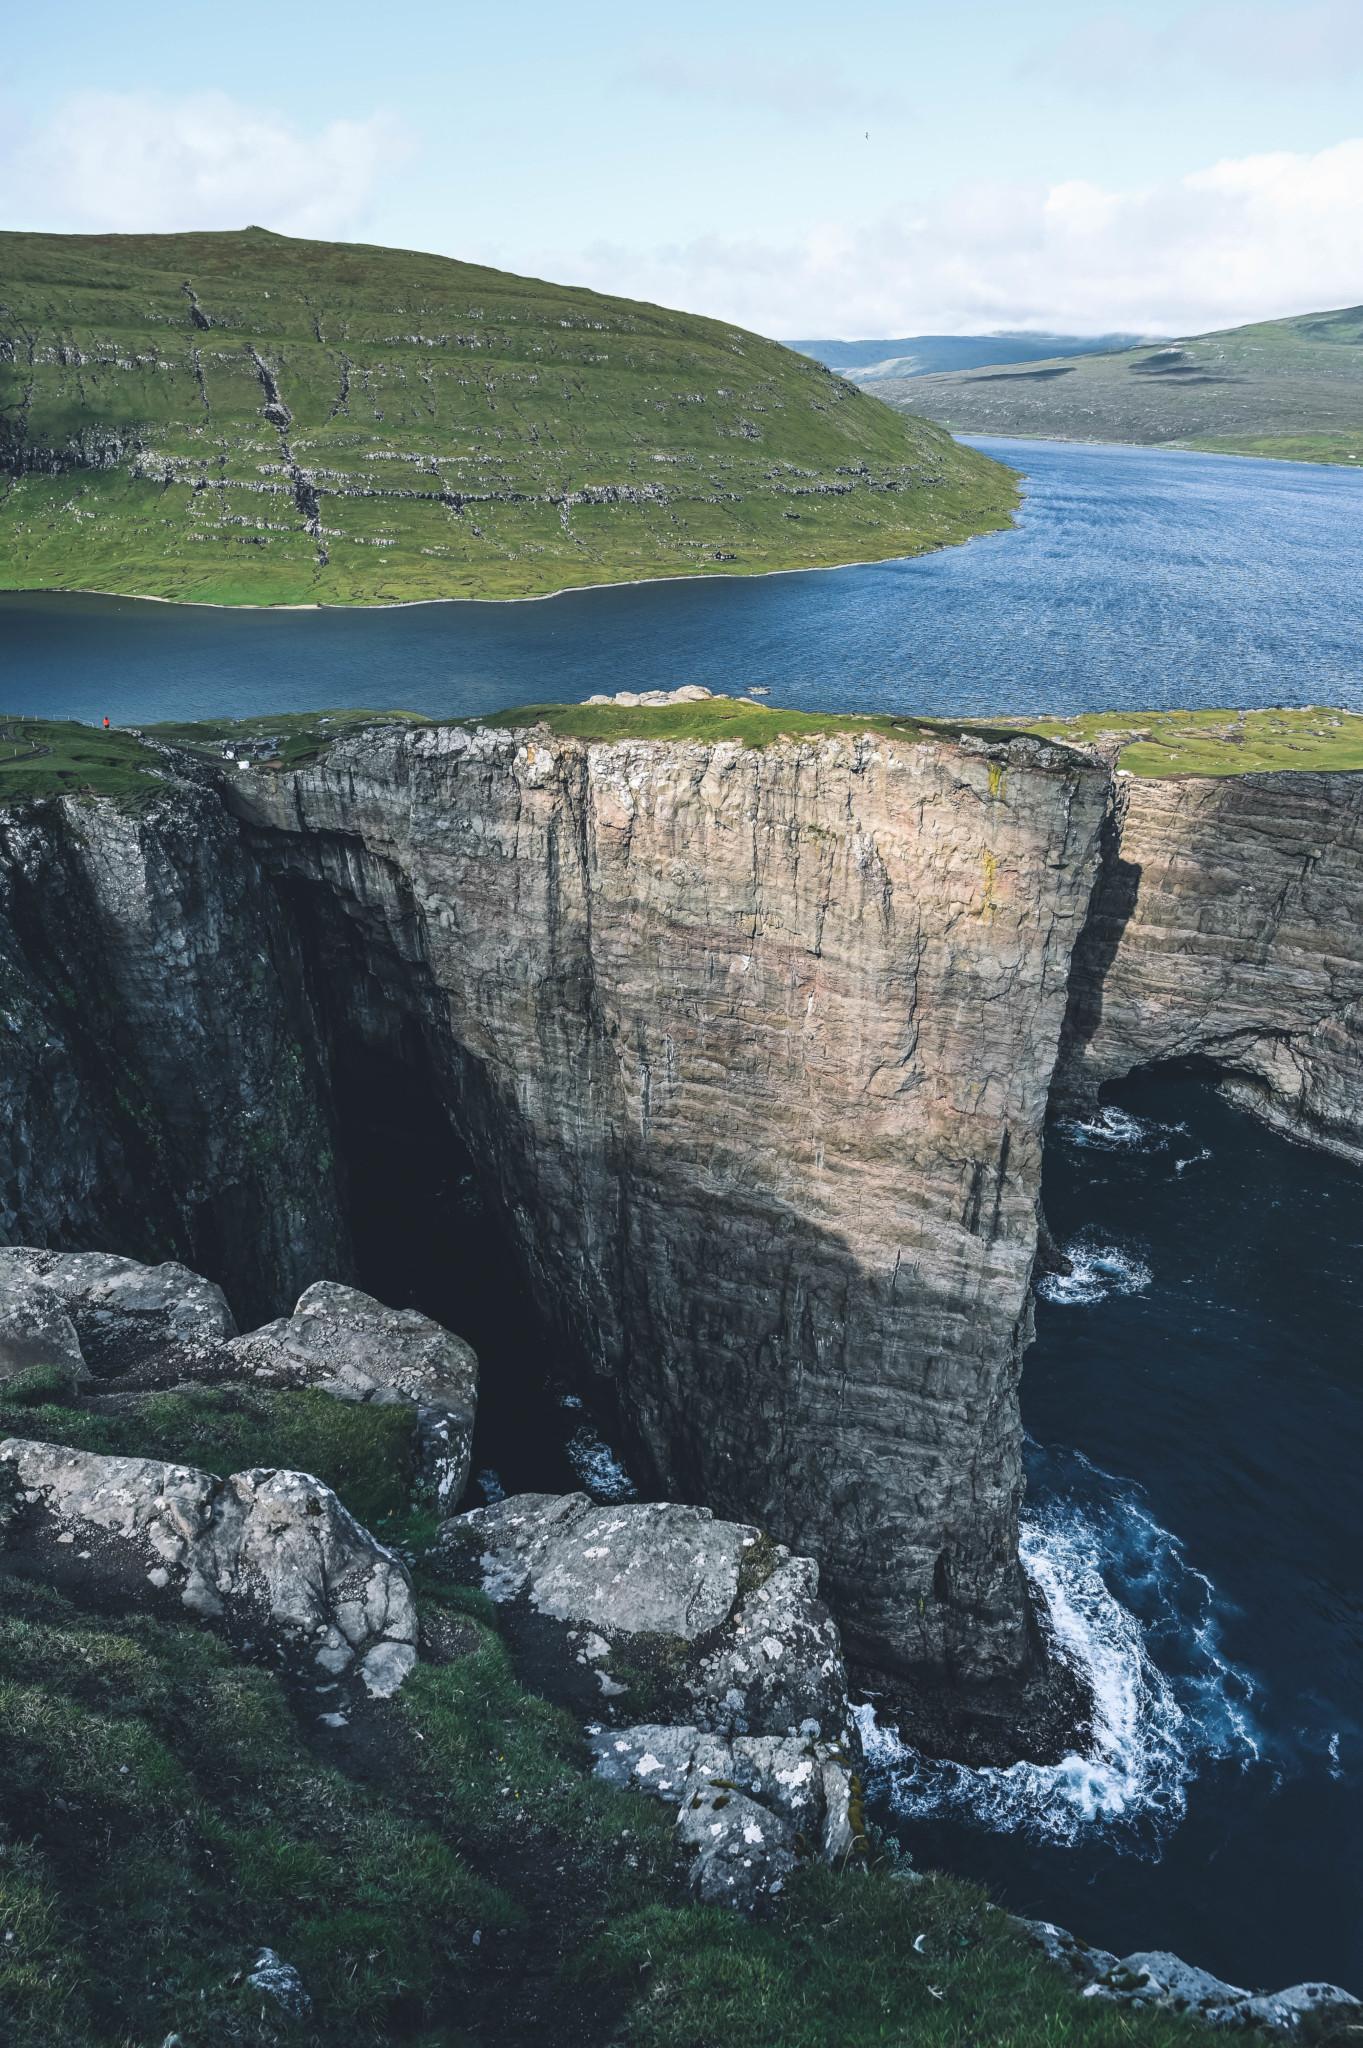 Felsen am Sørvagsvatn und Trælanípa: Highlight im Färöer Inseln Urlaub